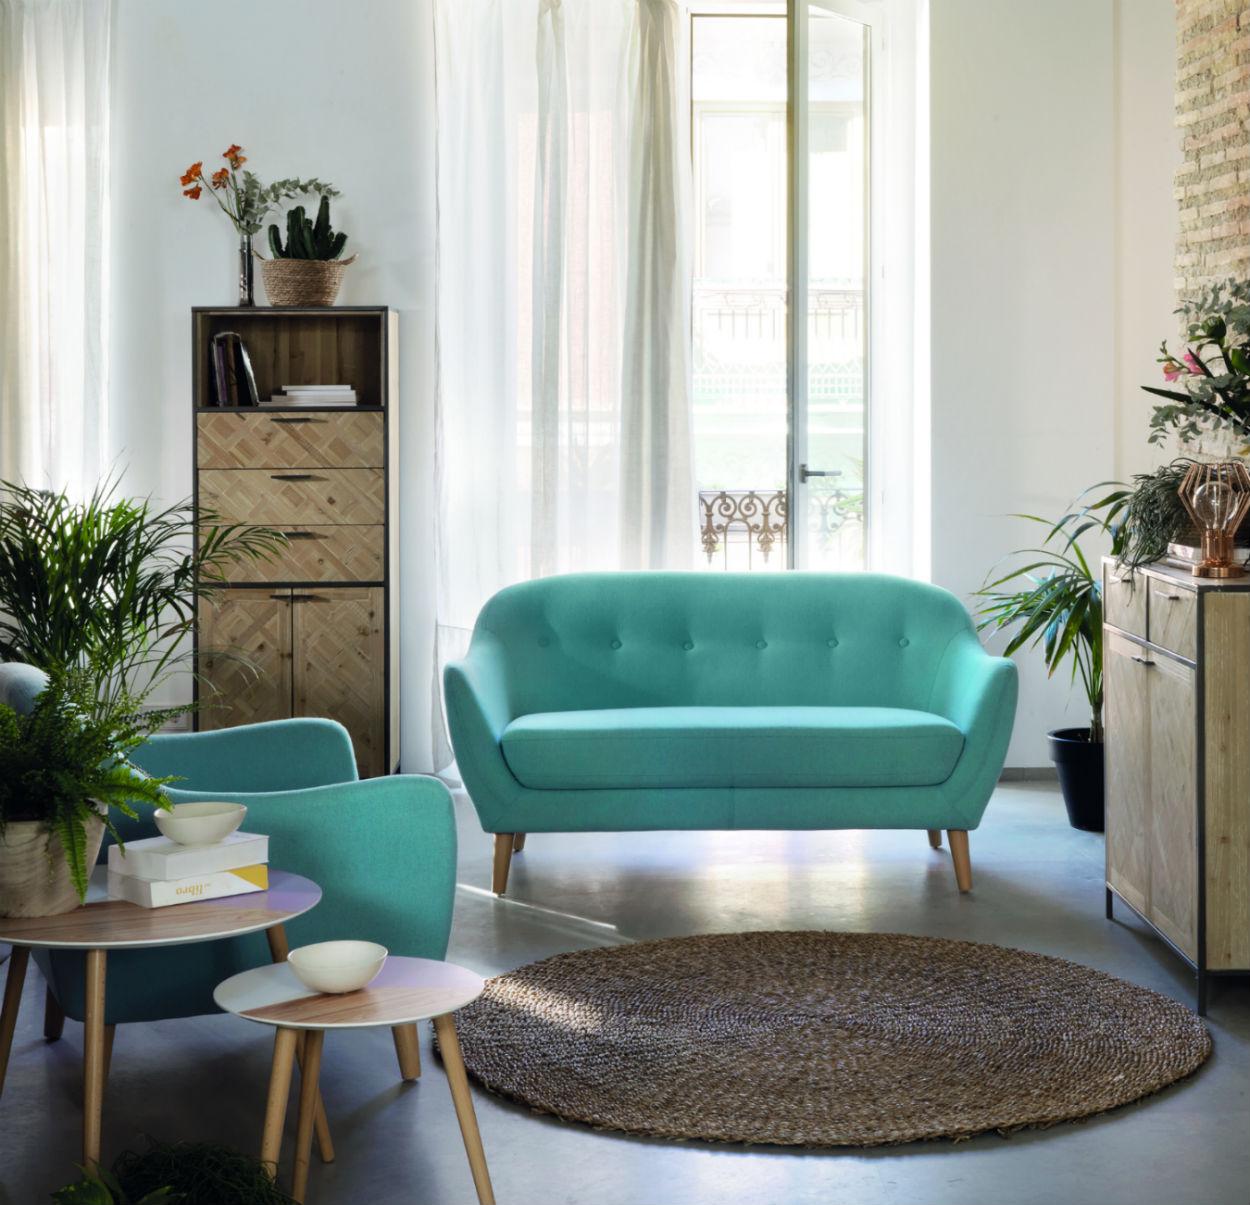 fauteuil style scandinave bleu